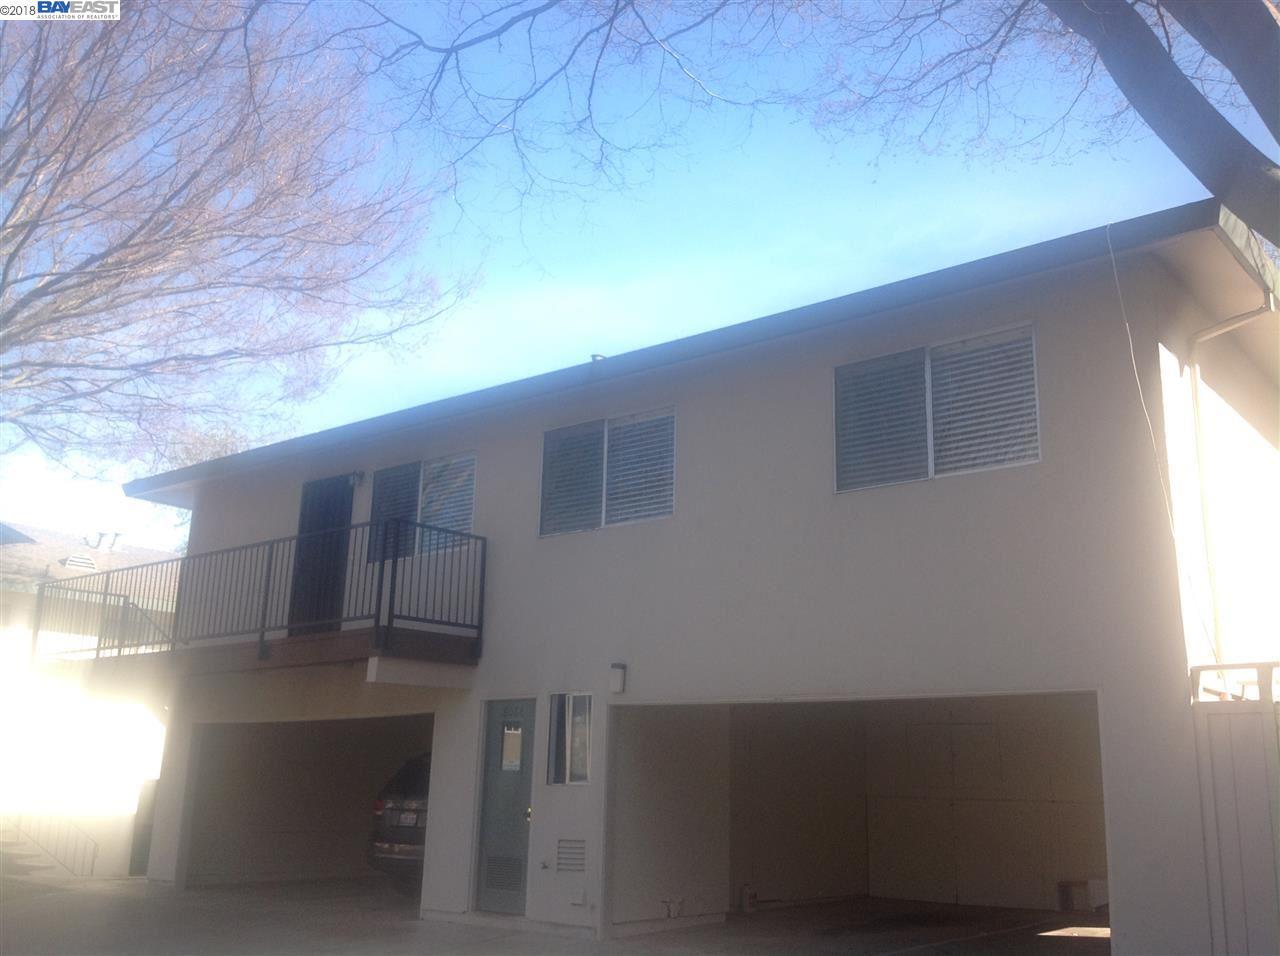 Casa unifamiliar adosada (Townhouse) por un Alquiler en 8086 ENSENADA Drive 8086 ENSENADA Drive Pleasanton, California 94588 Estados Unidos